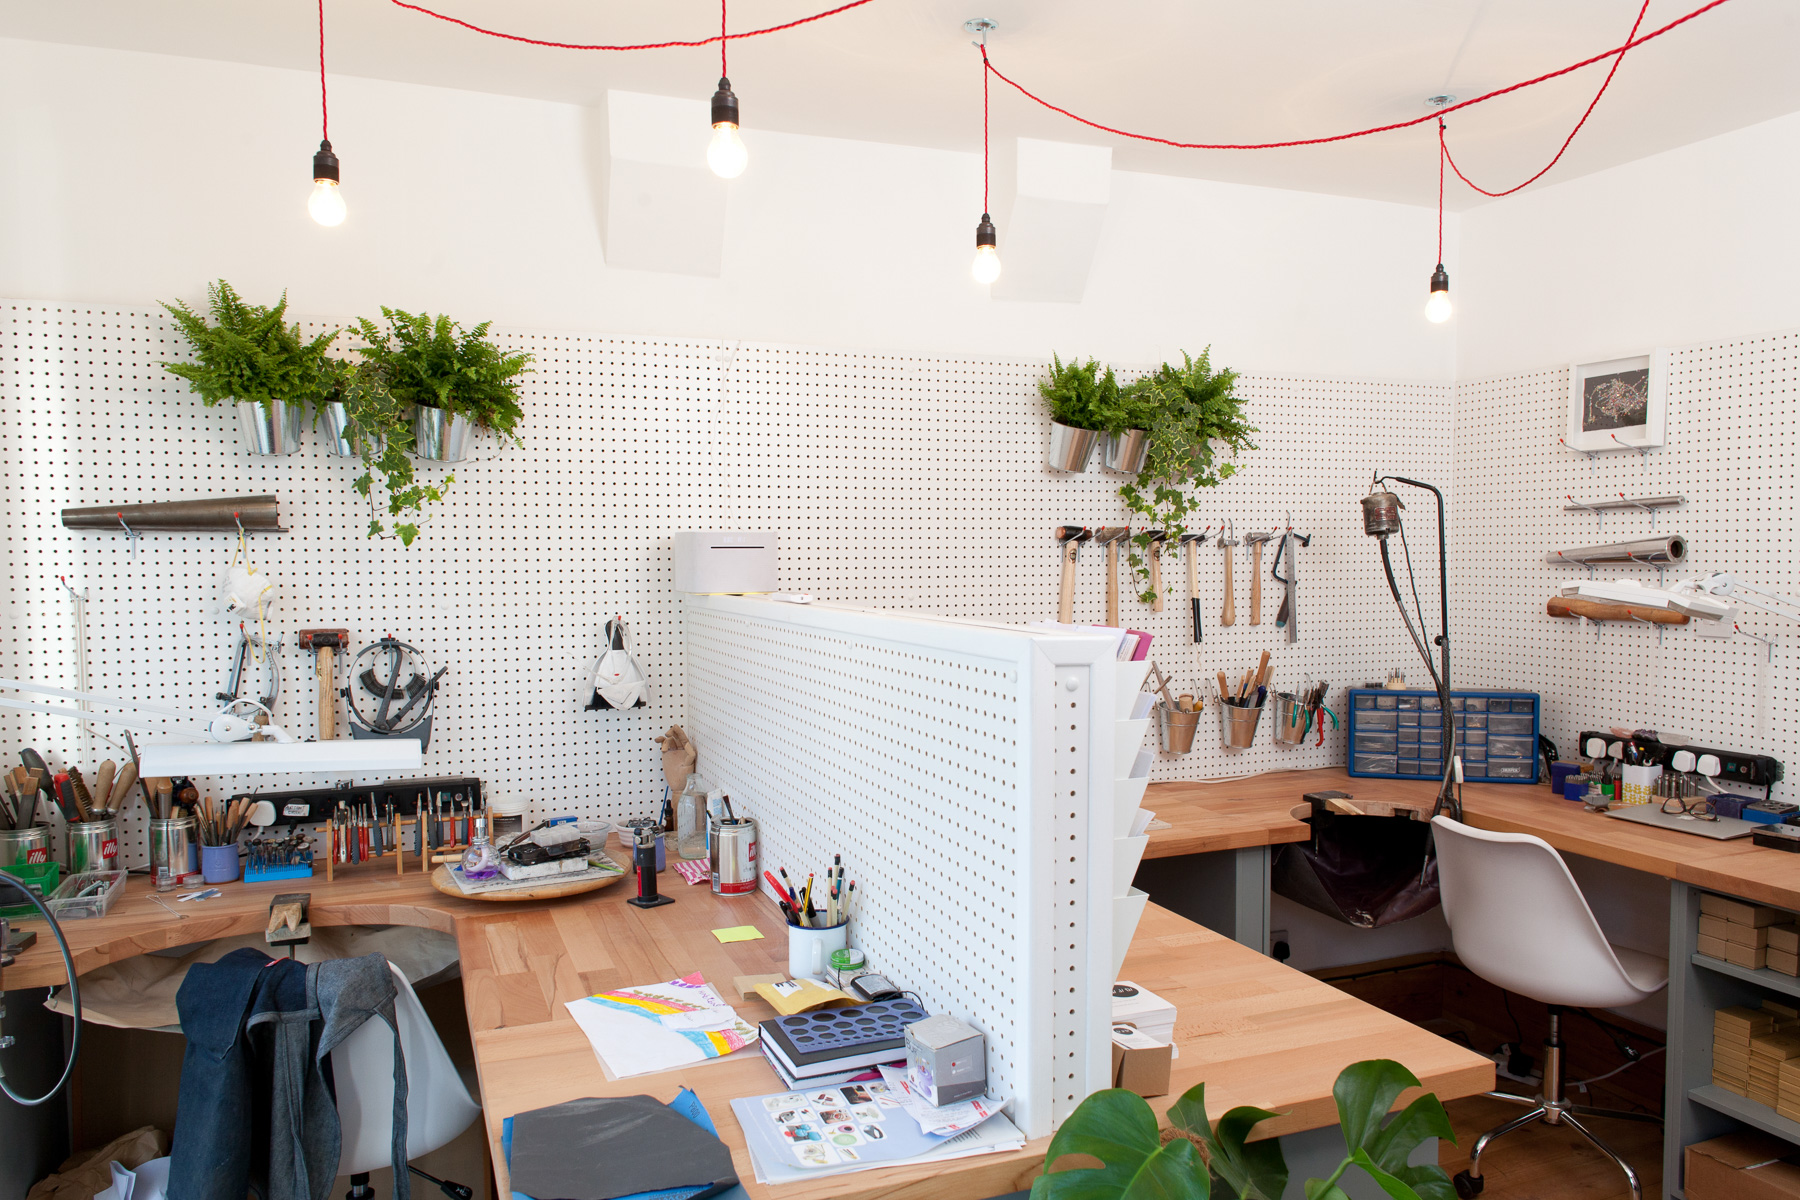 Sparrowhawk Studio Interiors - May 1.jpg